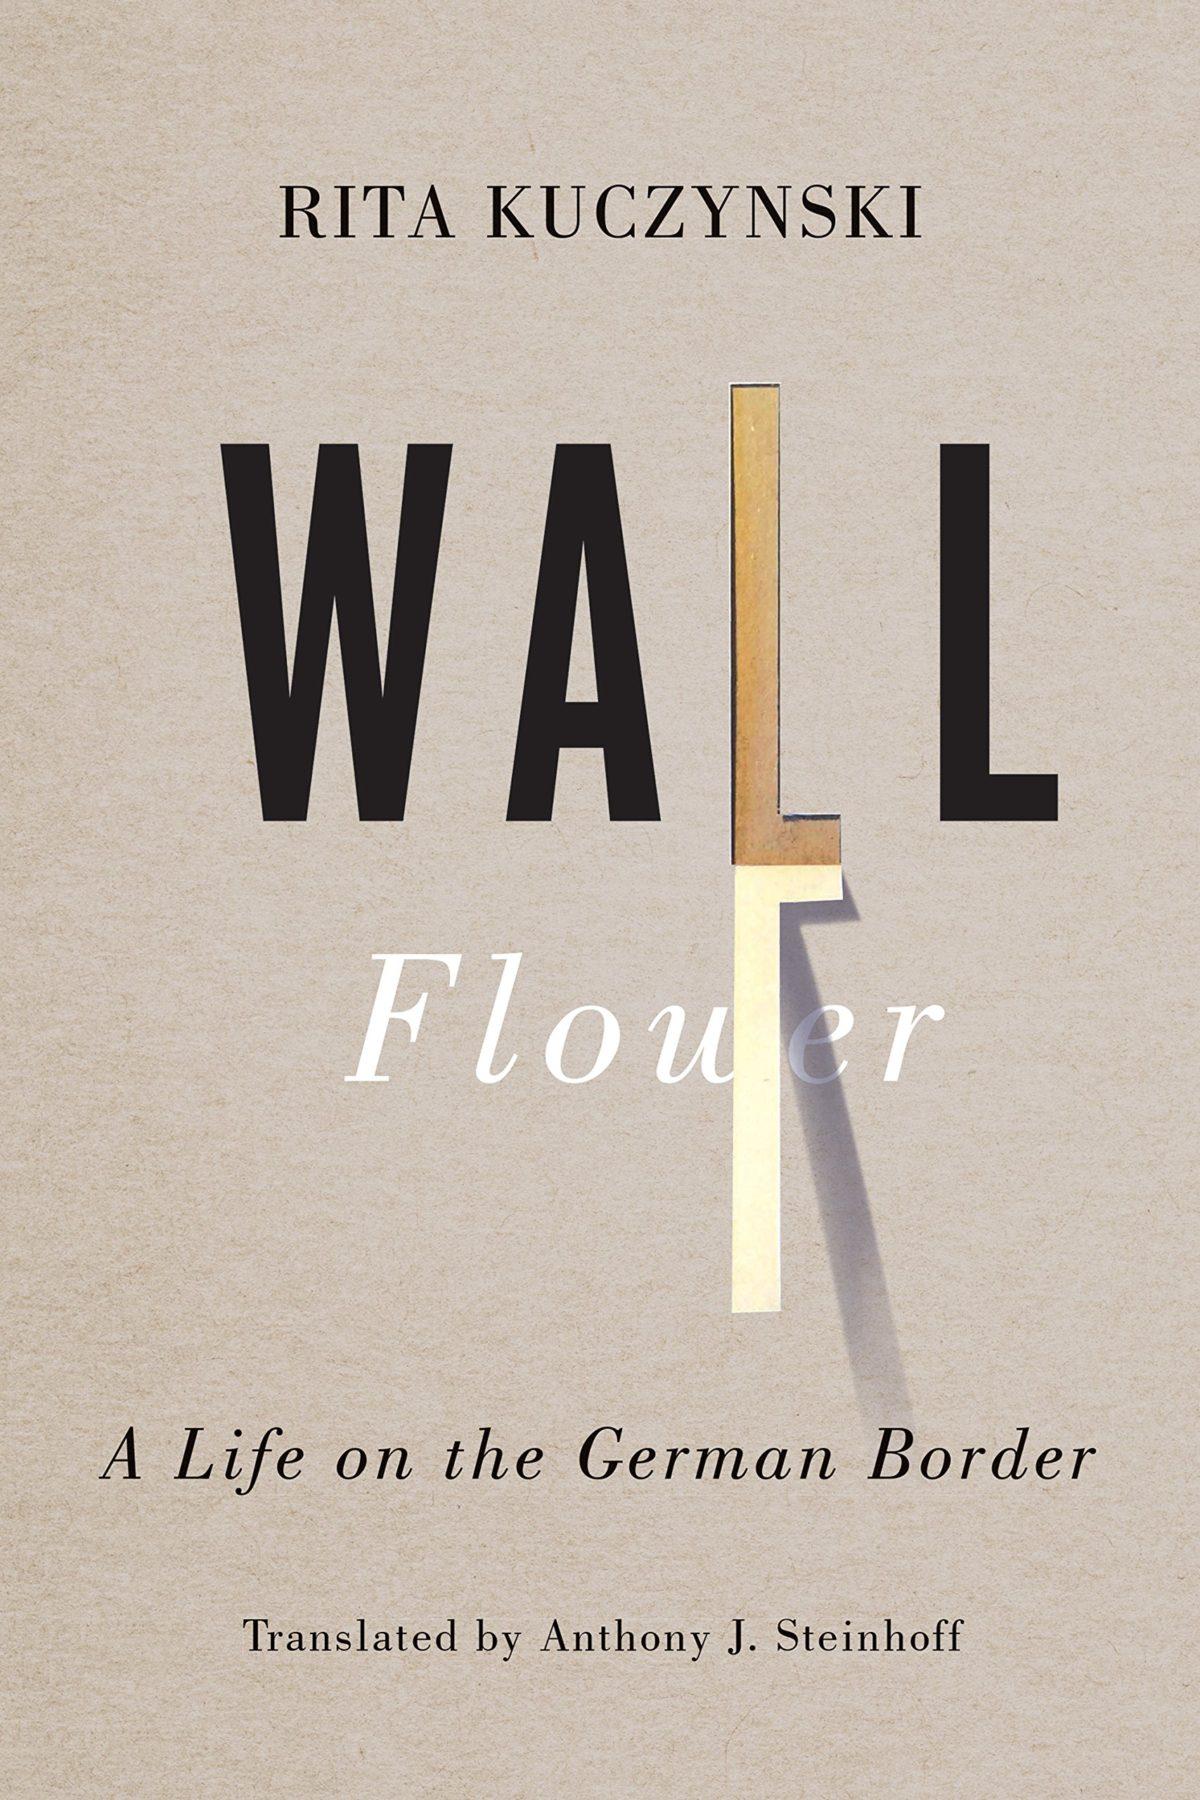 Creative Book Cover Queen : Wallflower design david drummond